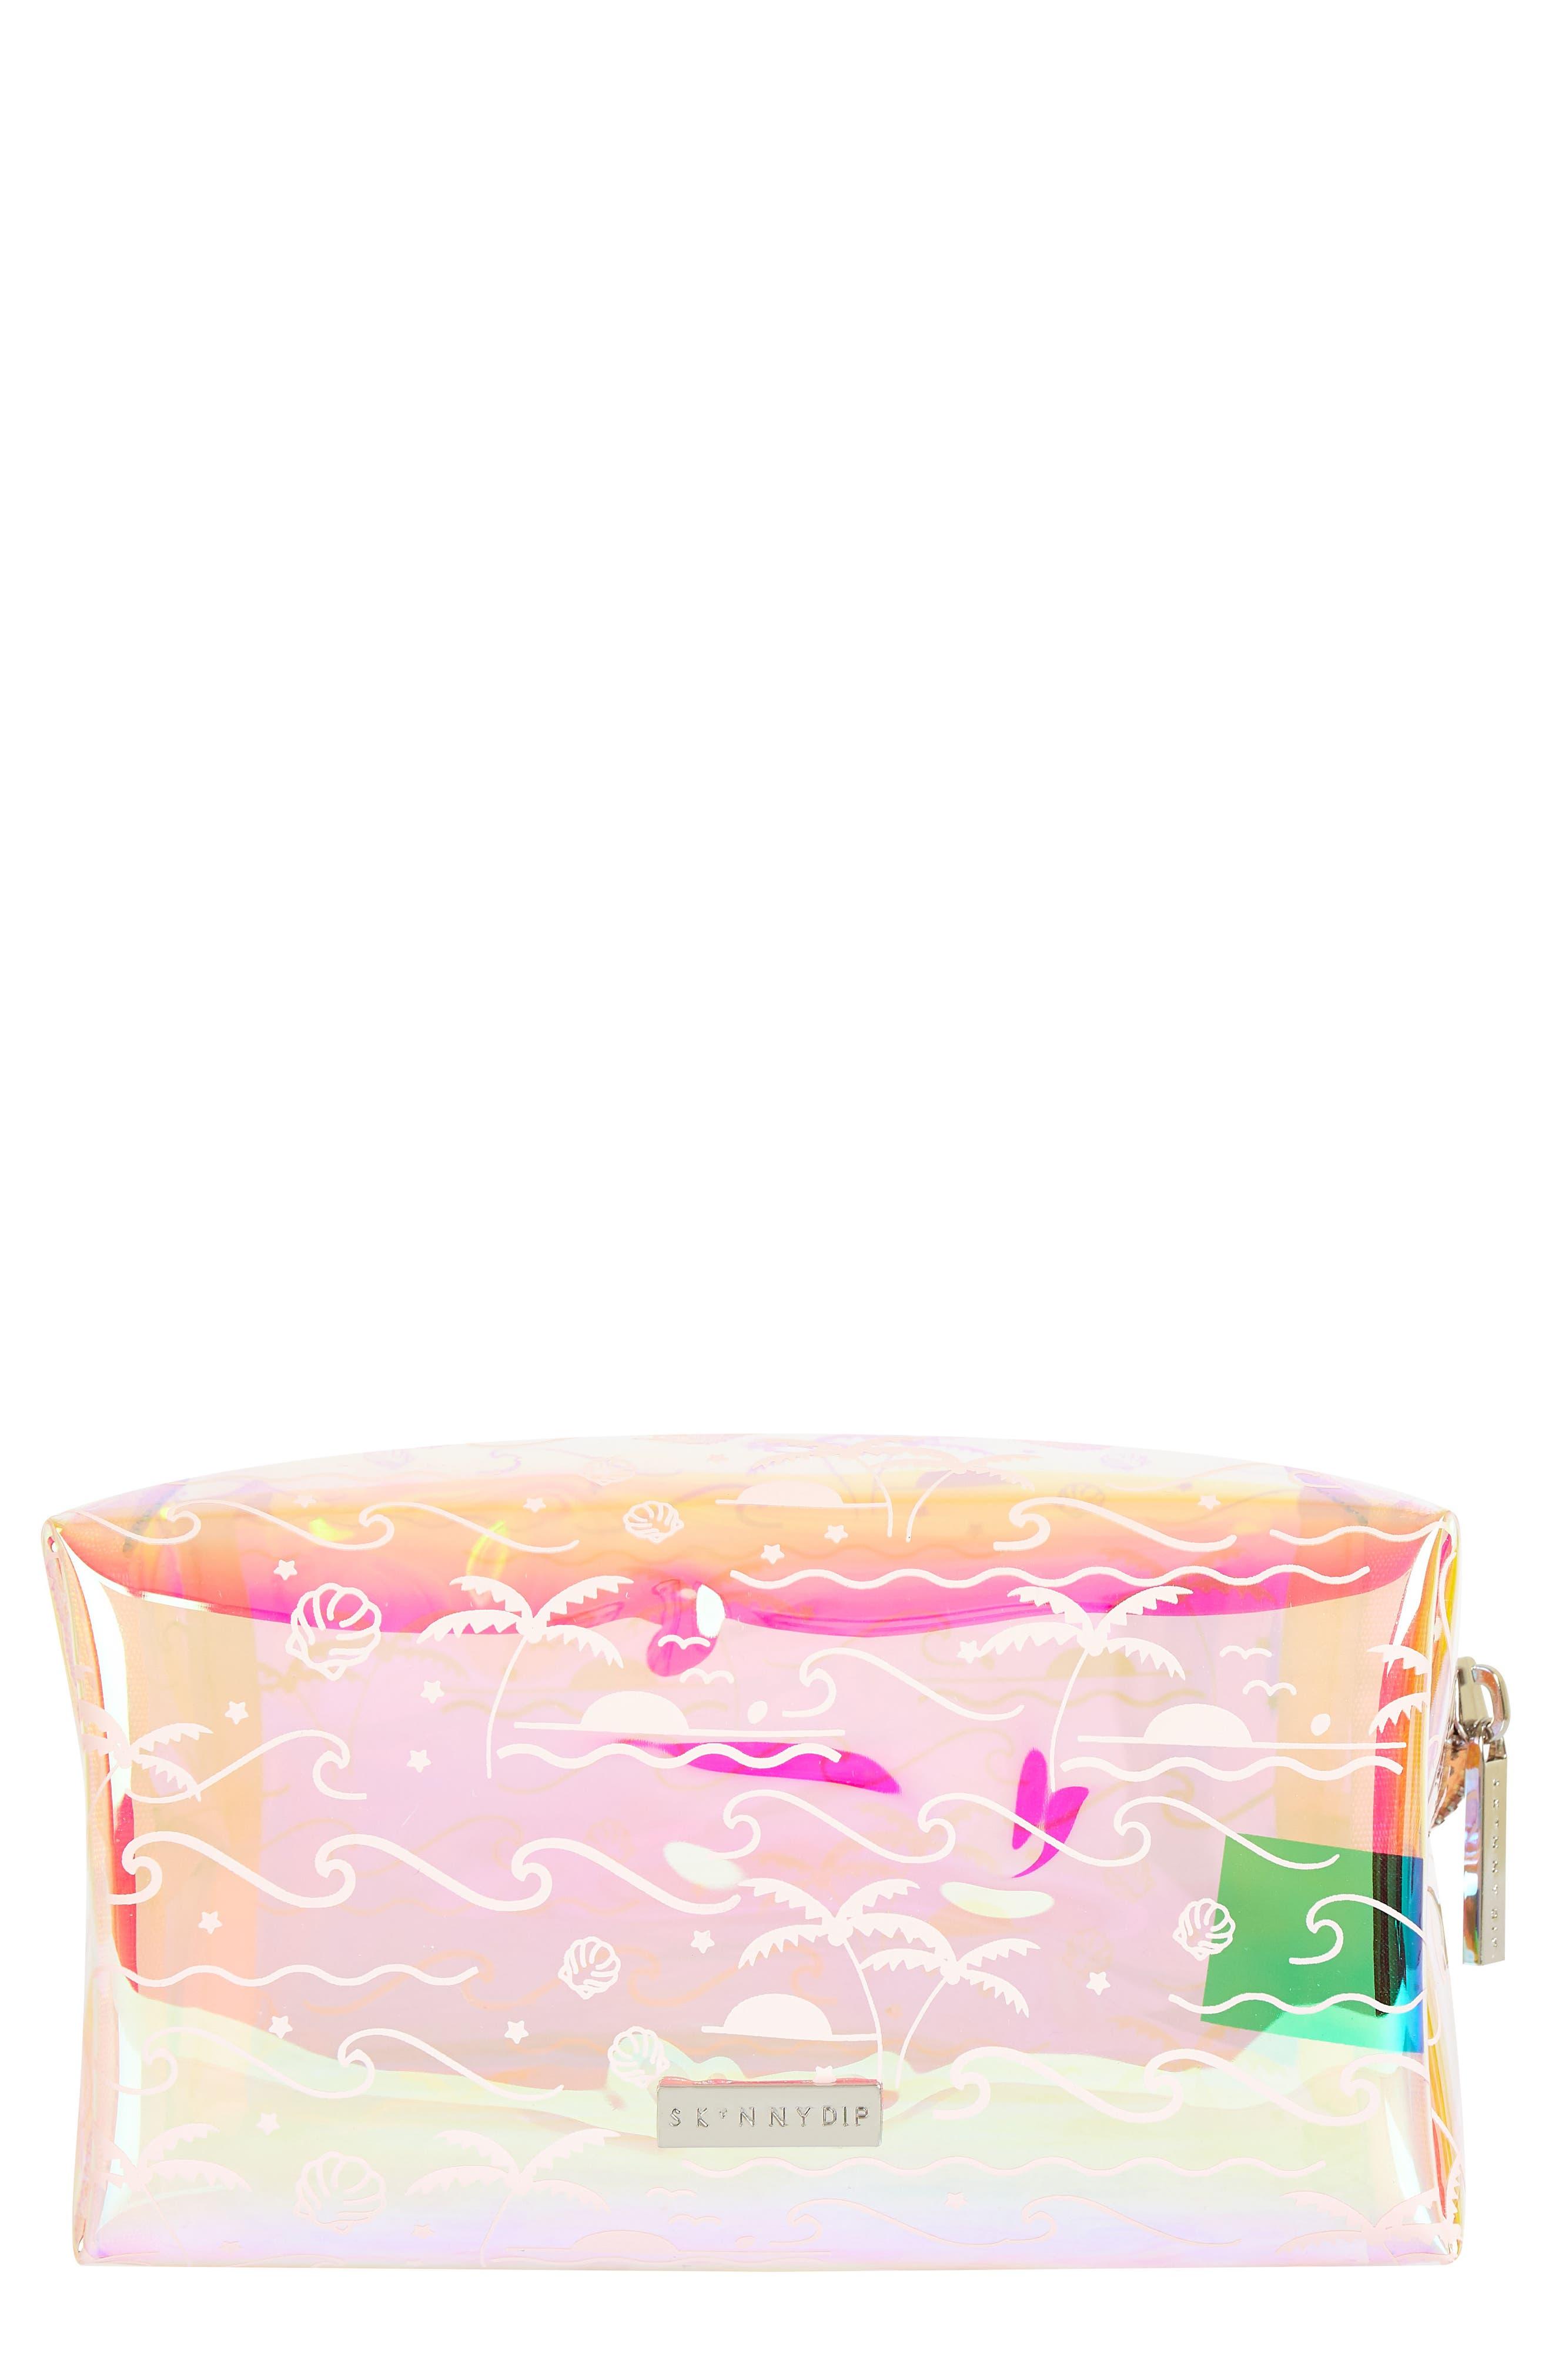 Skinny Dip Ocean Breeze Makeup Bag,                         Main,                         color, No Color